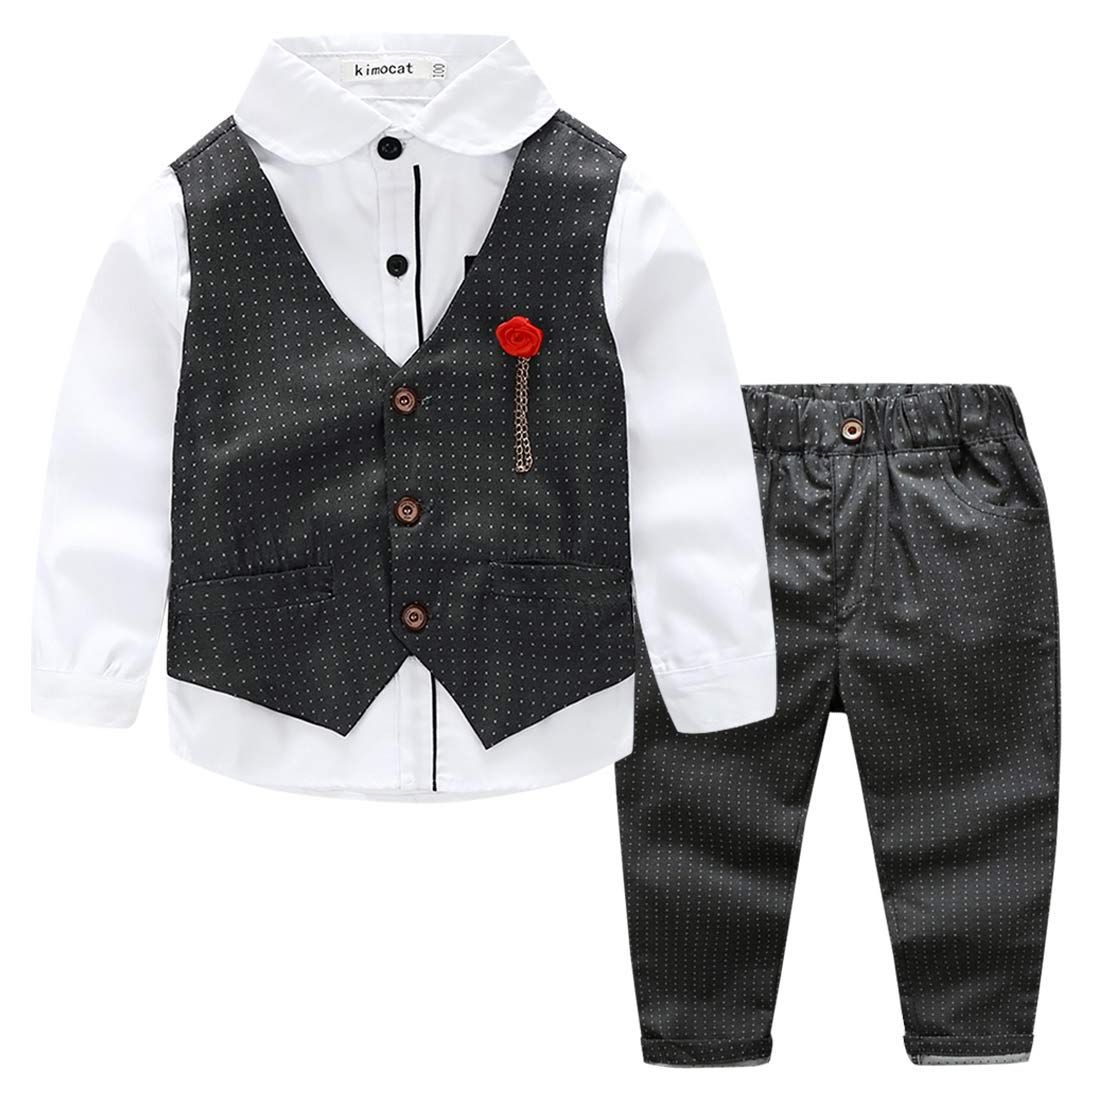 Kid Boys Gentlemen Formal Tuxedo Set Long Sleeve Breathable Waistcoat Outfits Classic Wedding Suit, 5Y